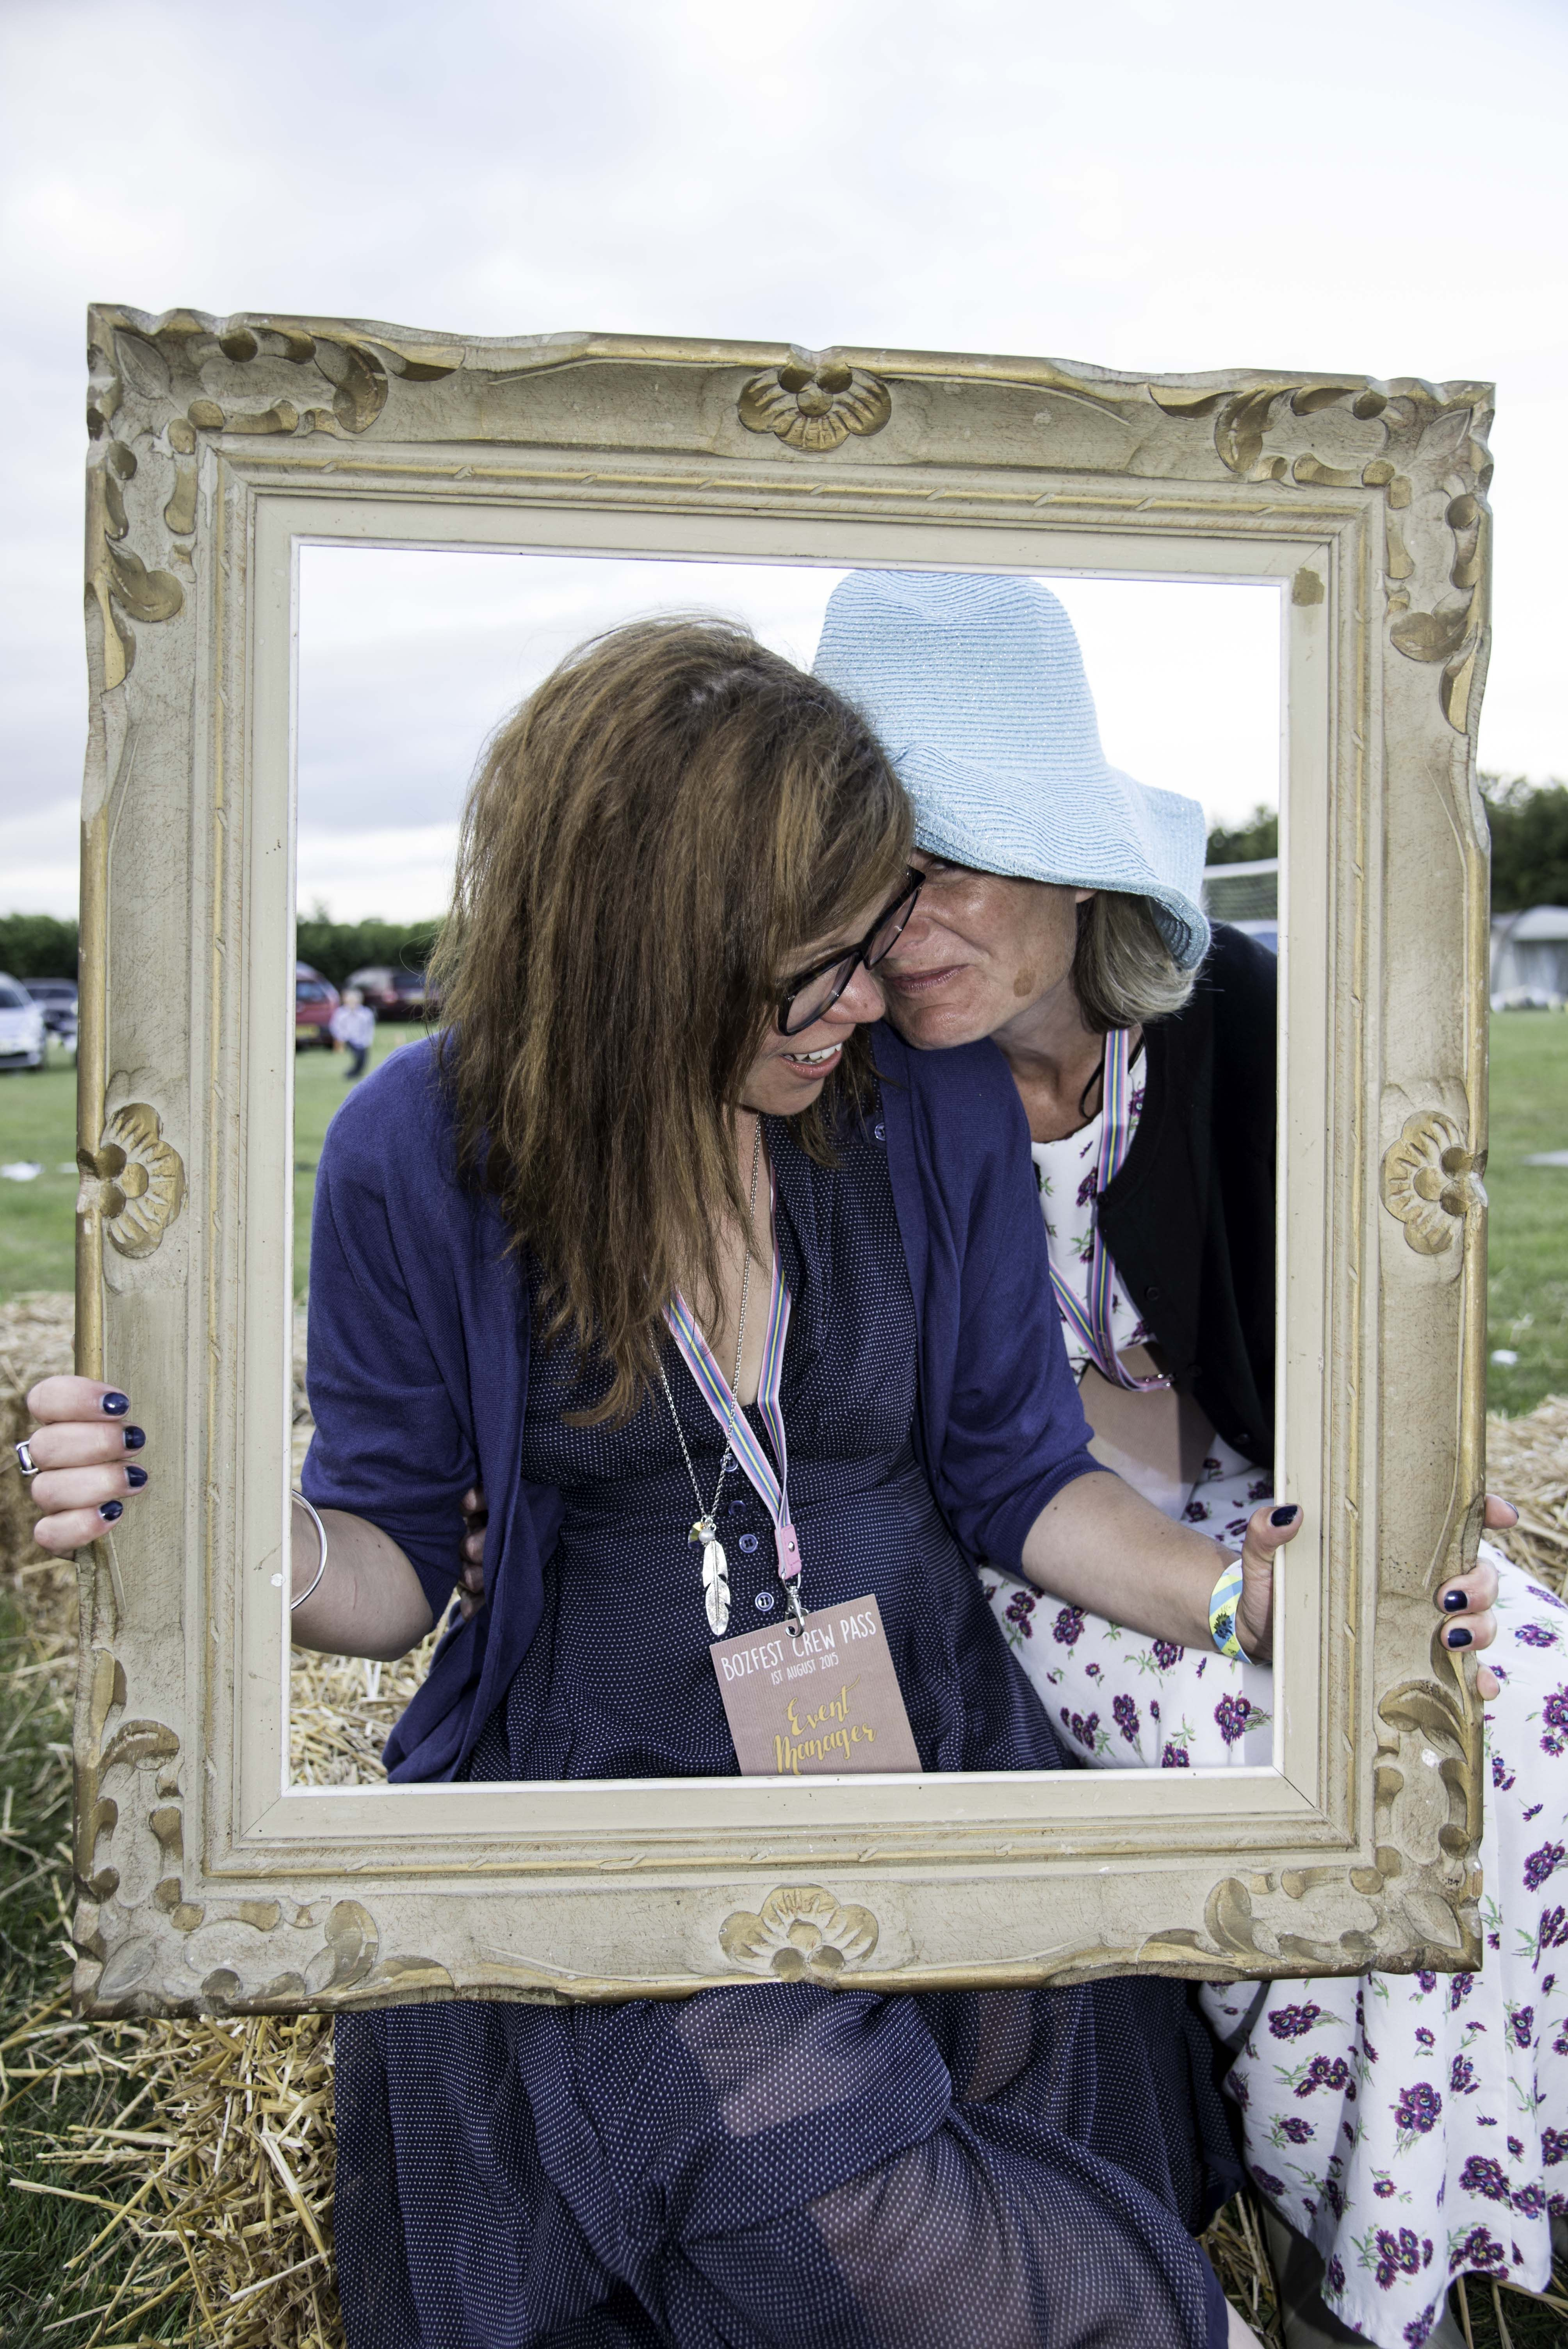 #wedding #festivalwedding #bozfest #pictureframe @loakleygreen